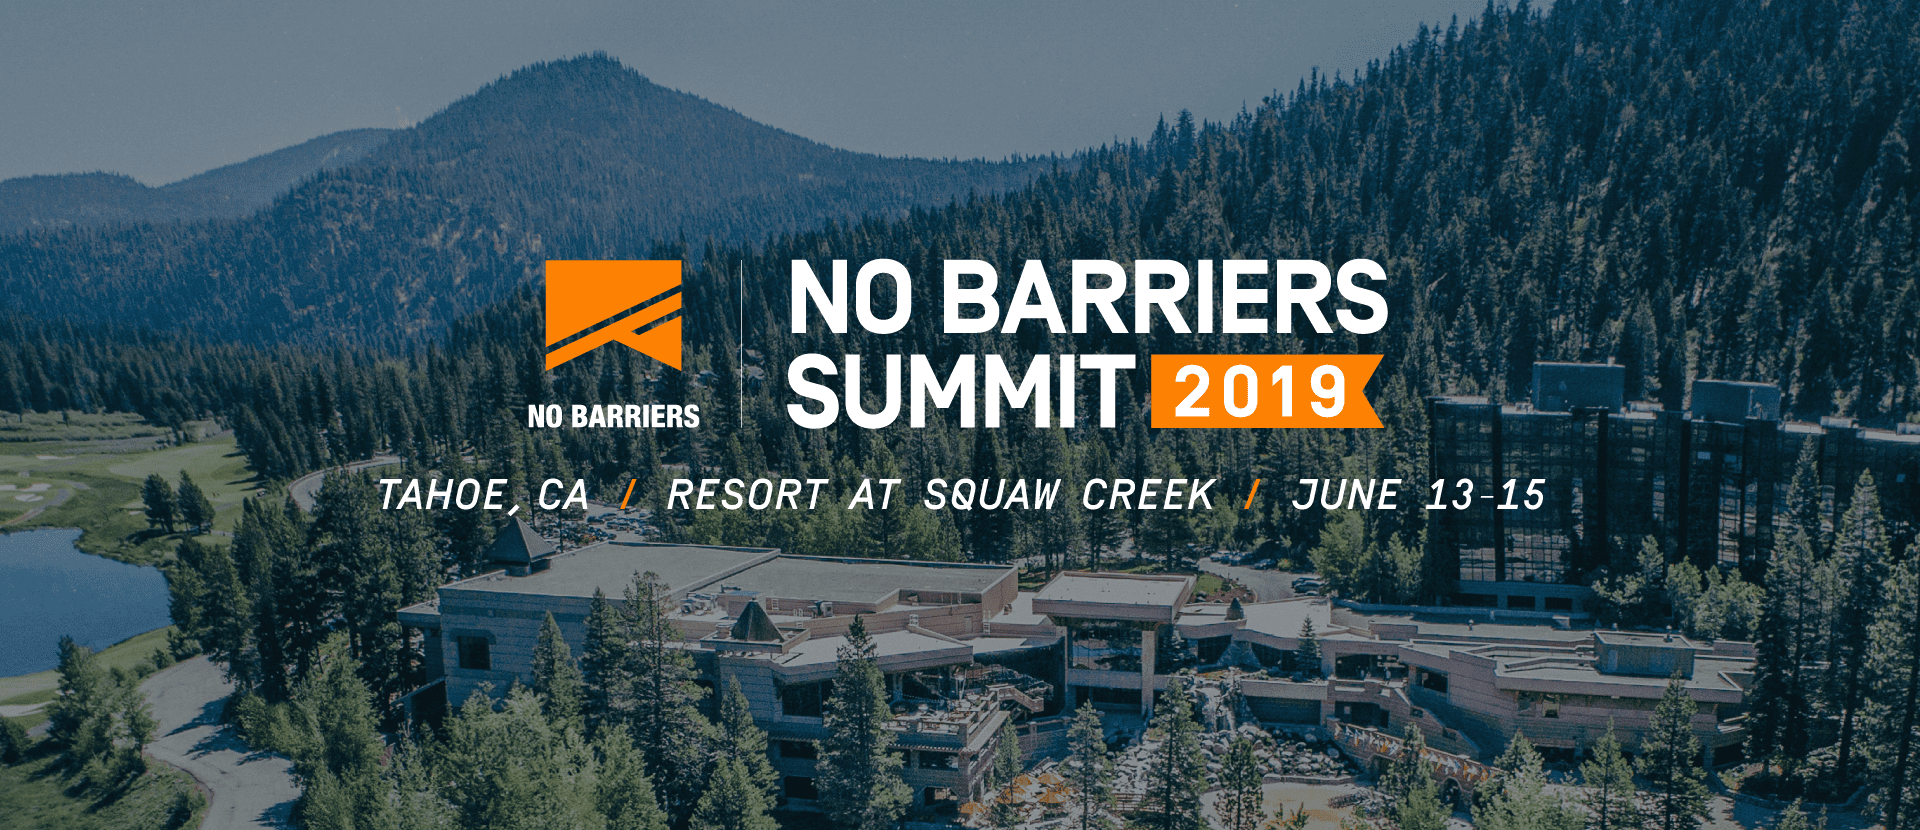 No Barriers Summit Tahoe - Go Tahoe North